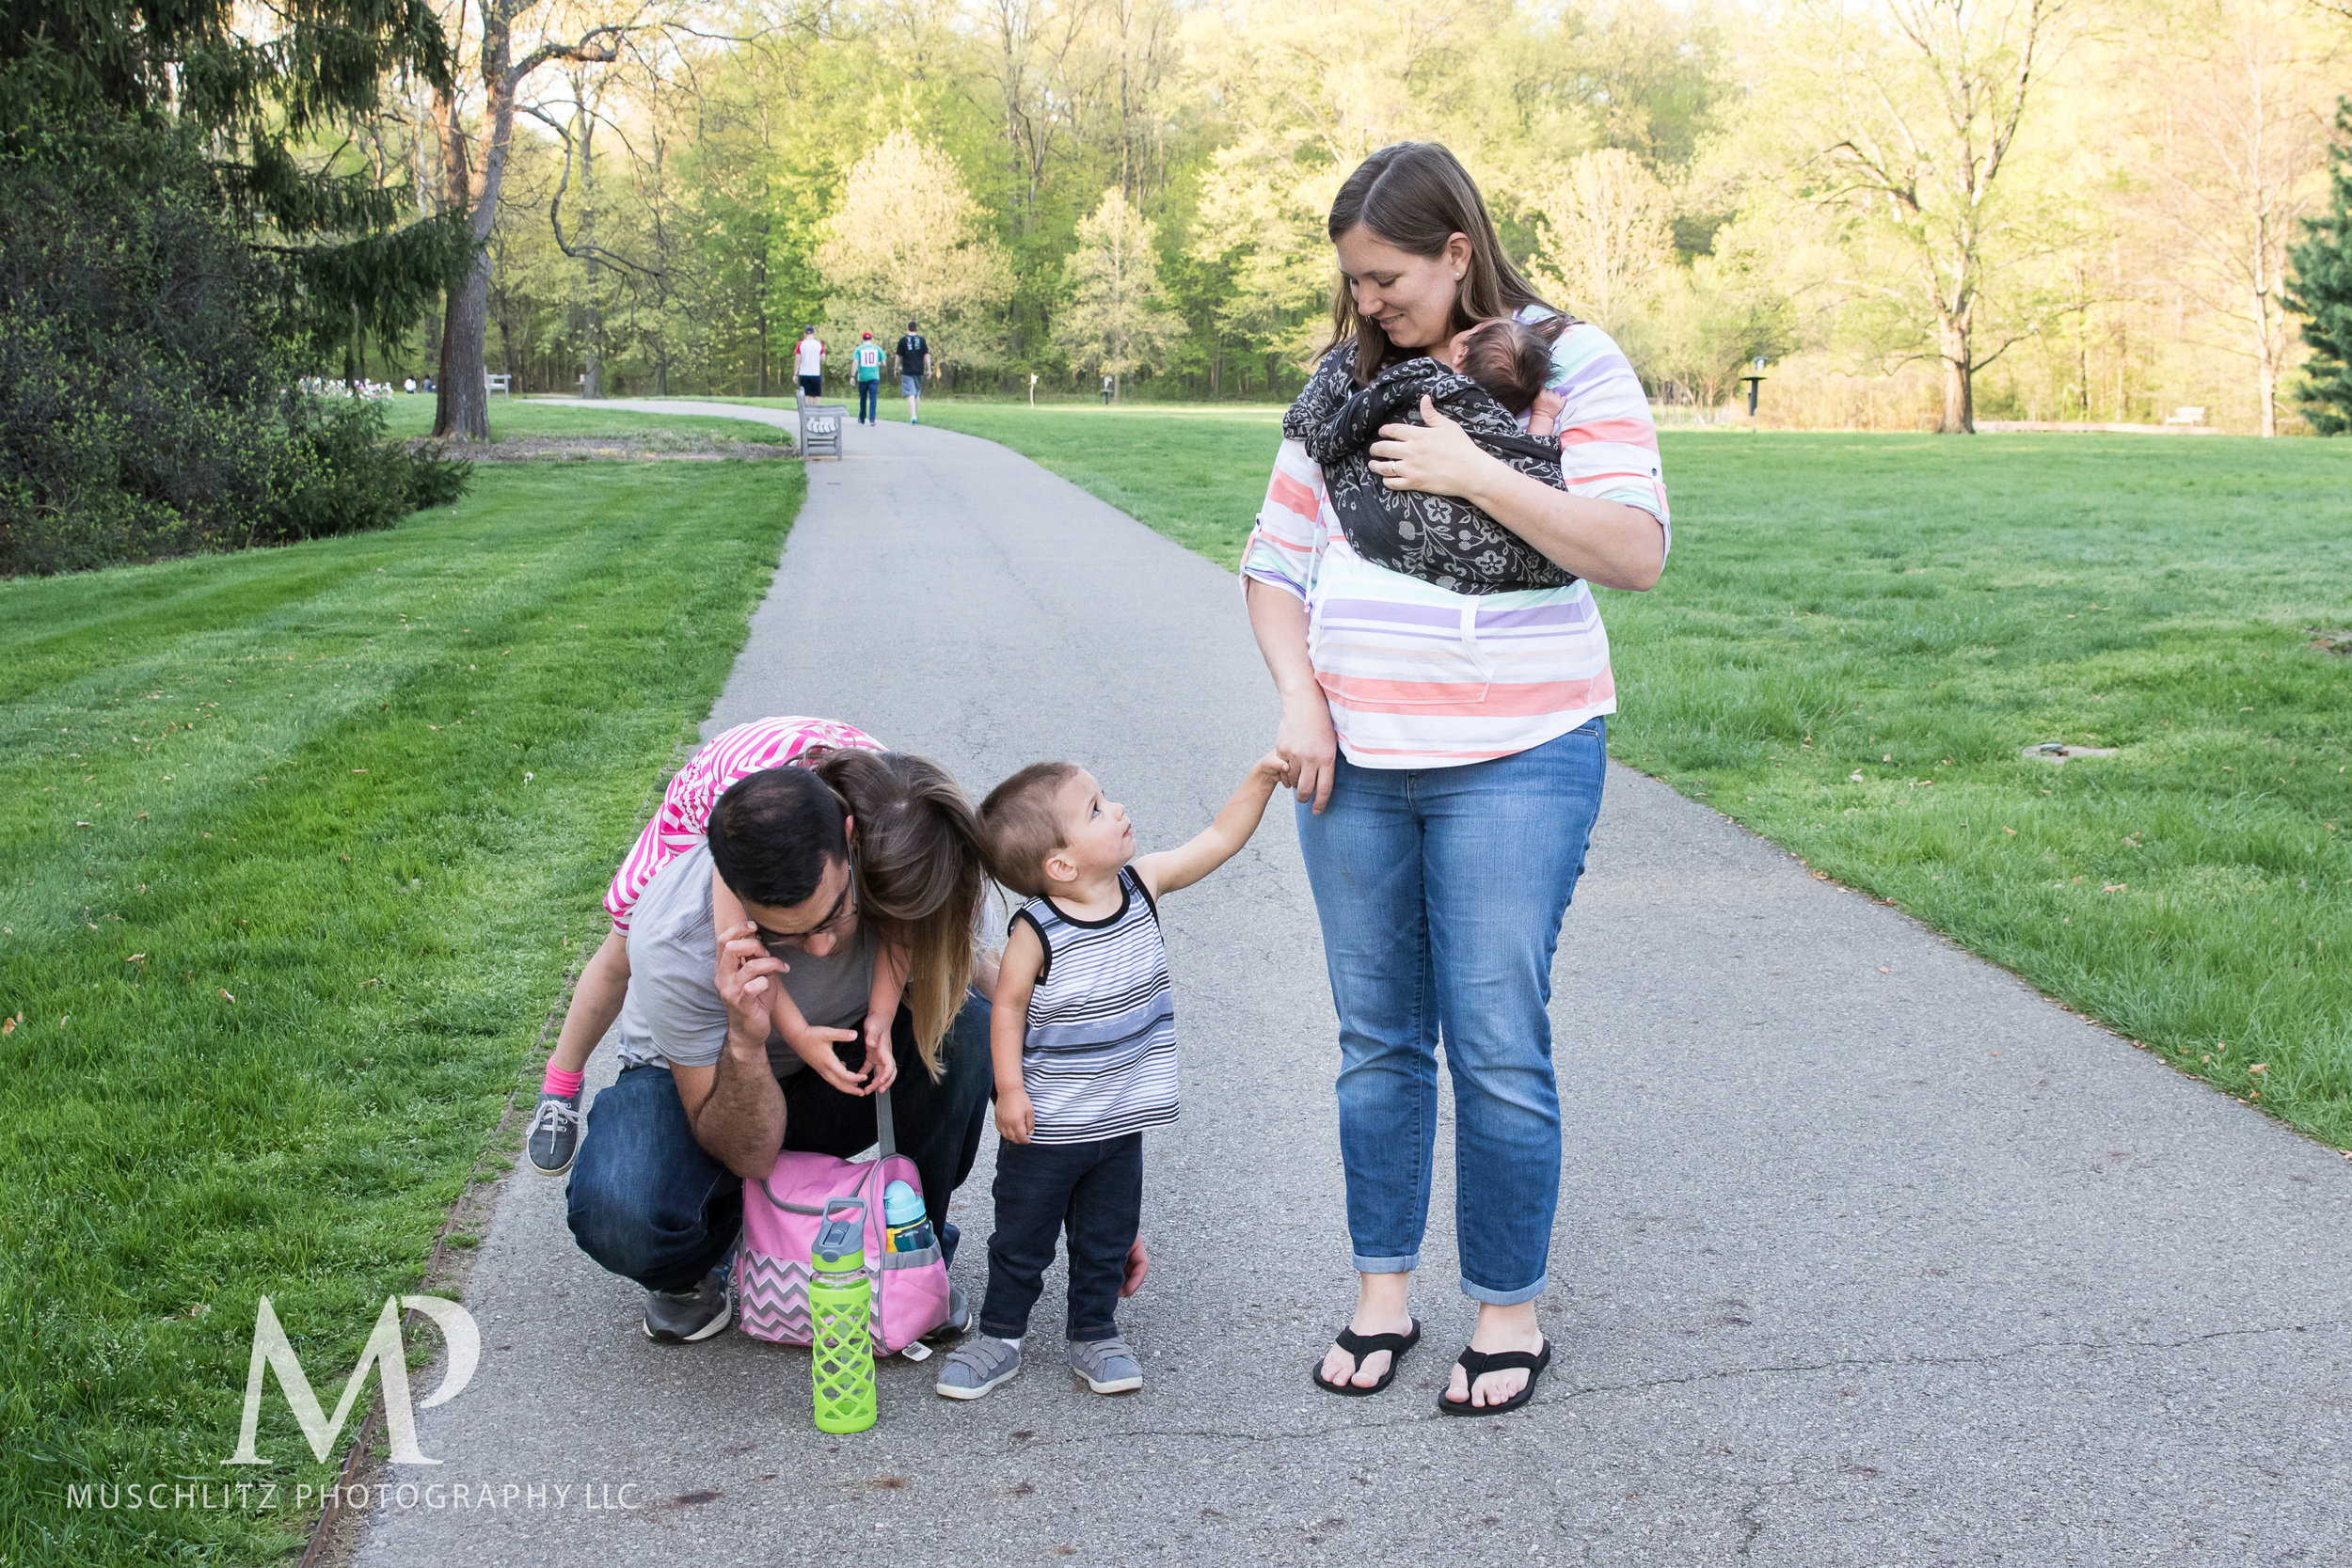 newborn-baby-family-portrait-session-spring-inniswood-metro-gardens-columbus-ohio-025.JPG